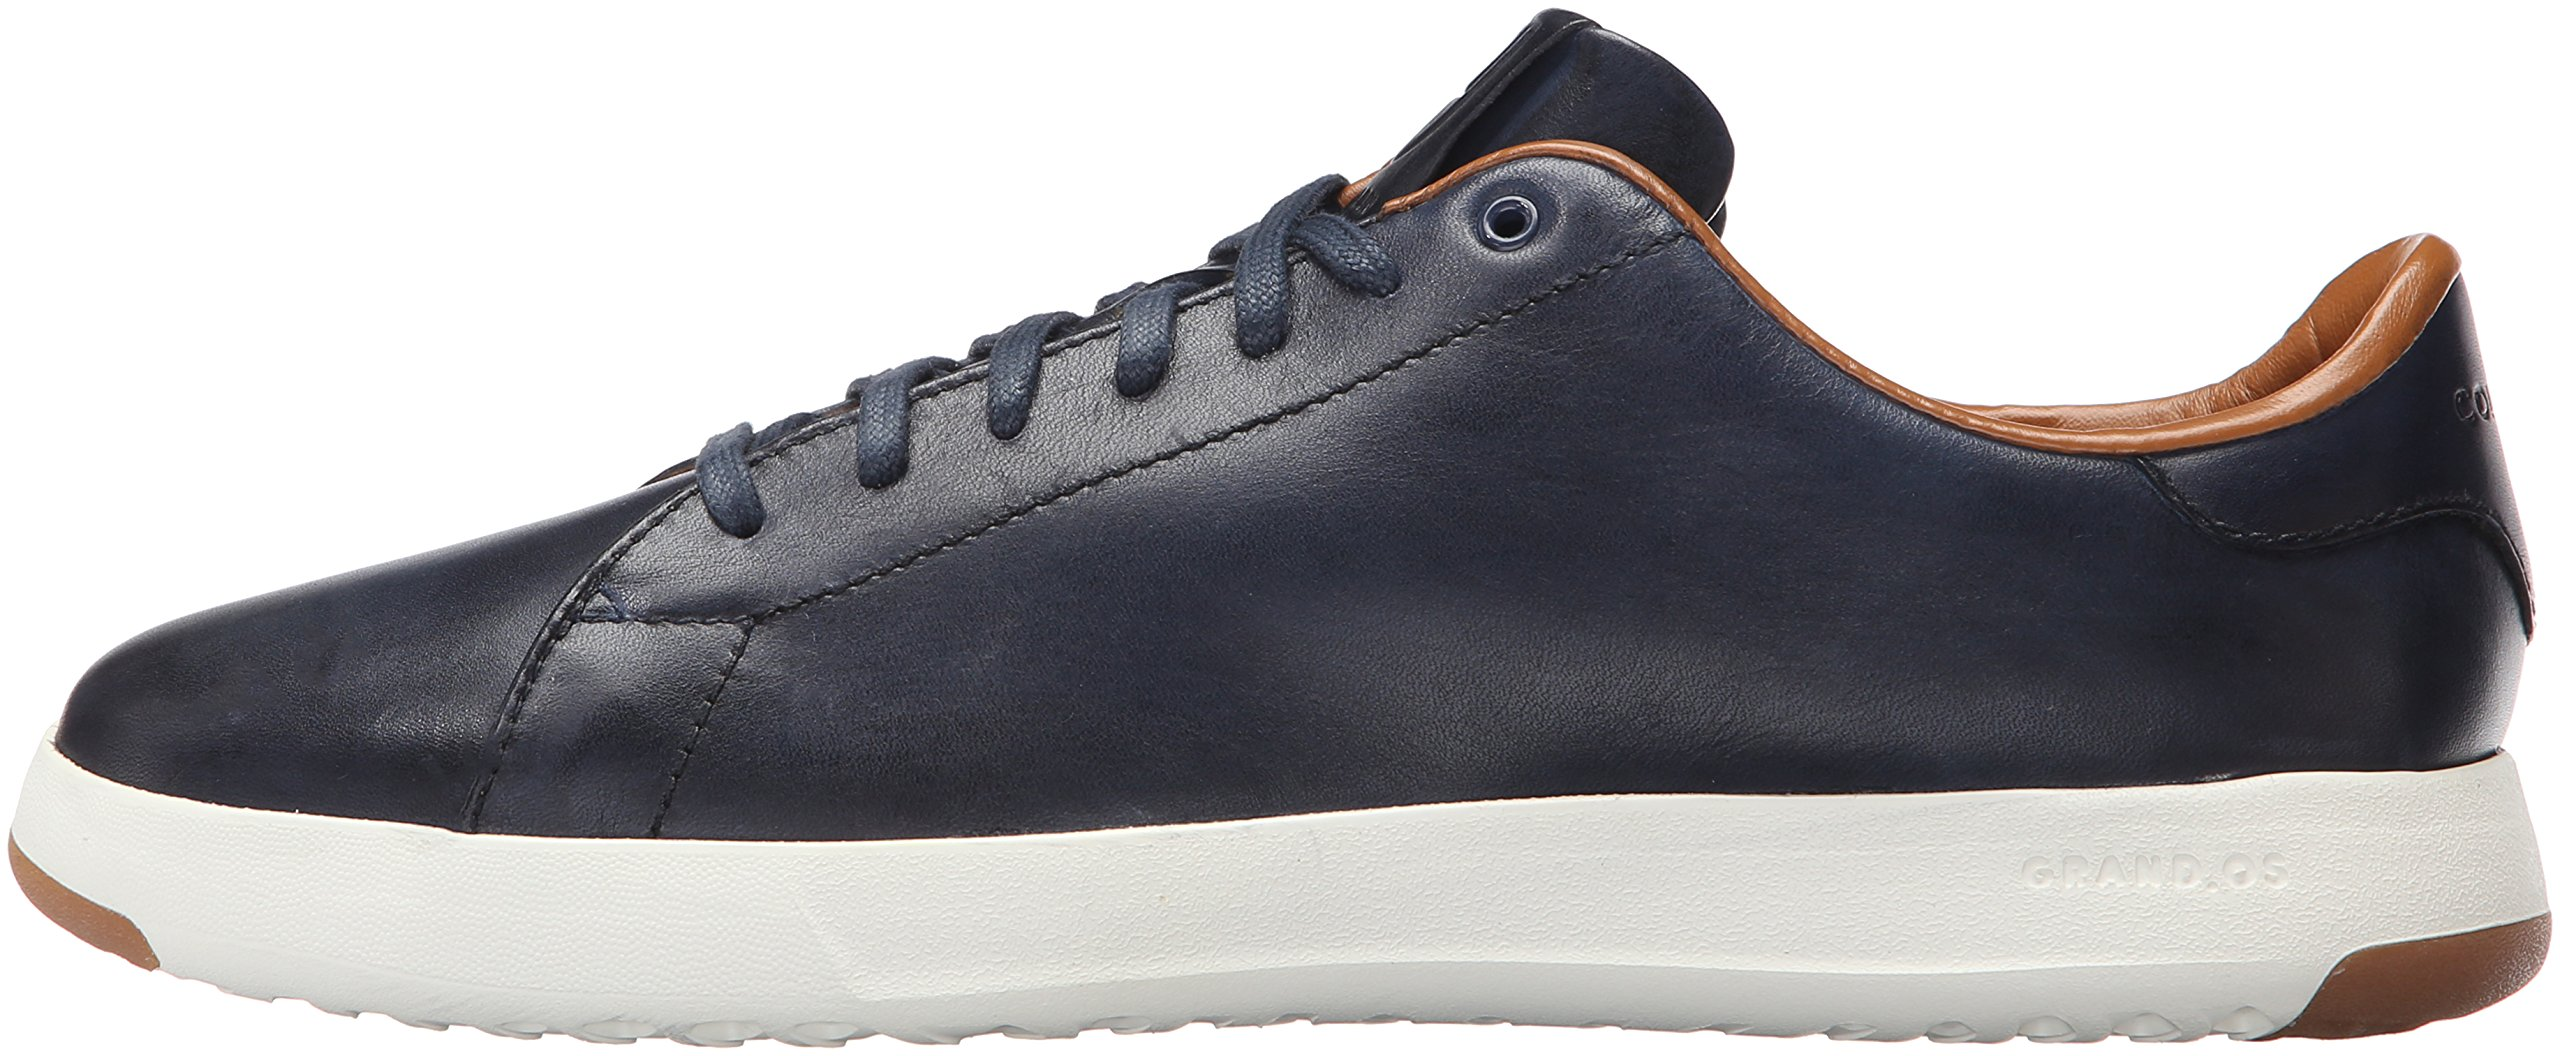 Cole Haan Men's Grandpro Tennis Fashion Sneaker, Blazer Blue Hand Stain, 7 M US by Cole Haan (Image #5)